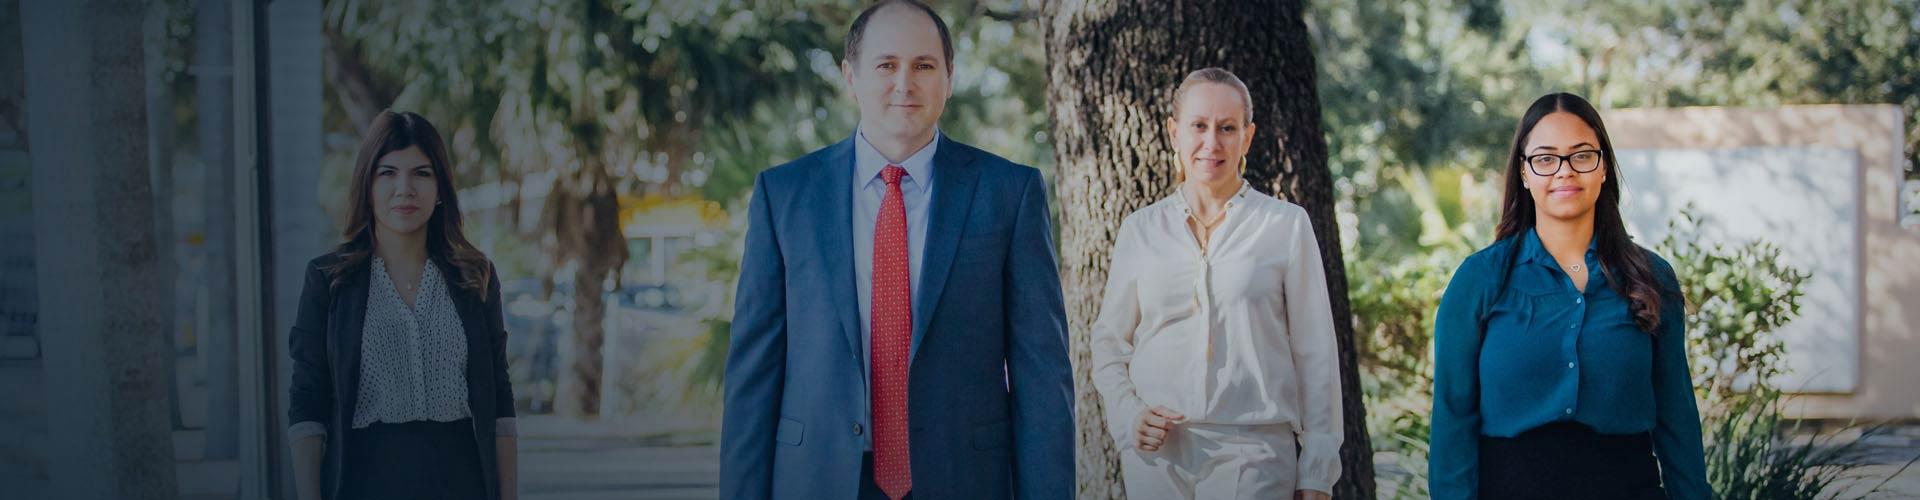 Debt Consolidation Attorneys - Stiberman Law Firm